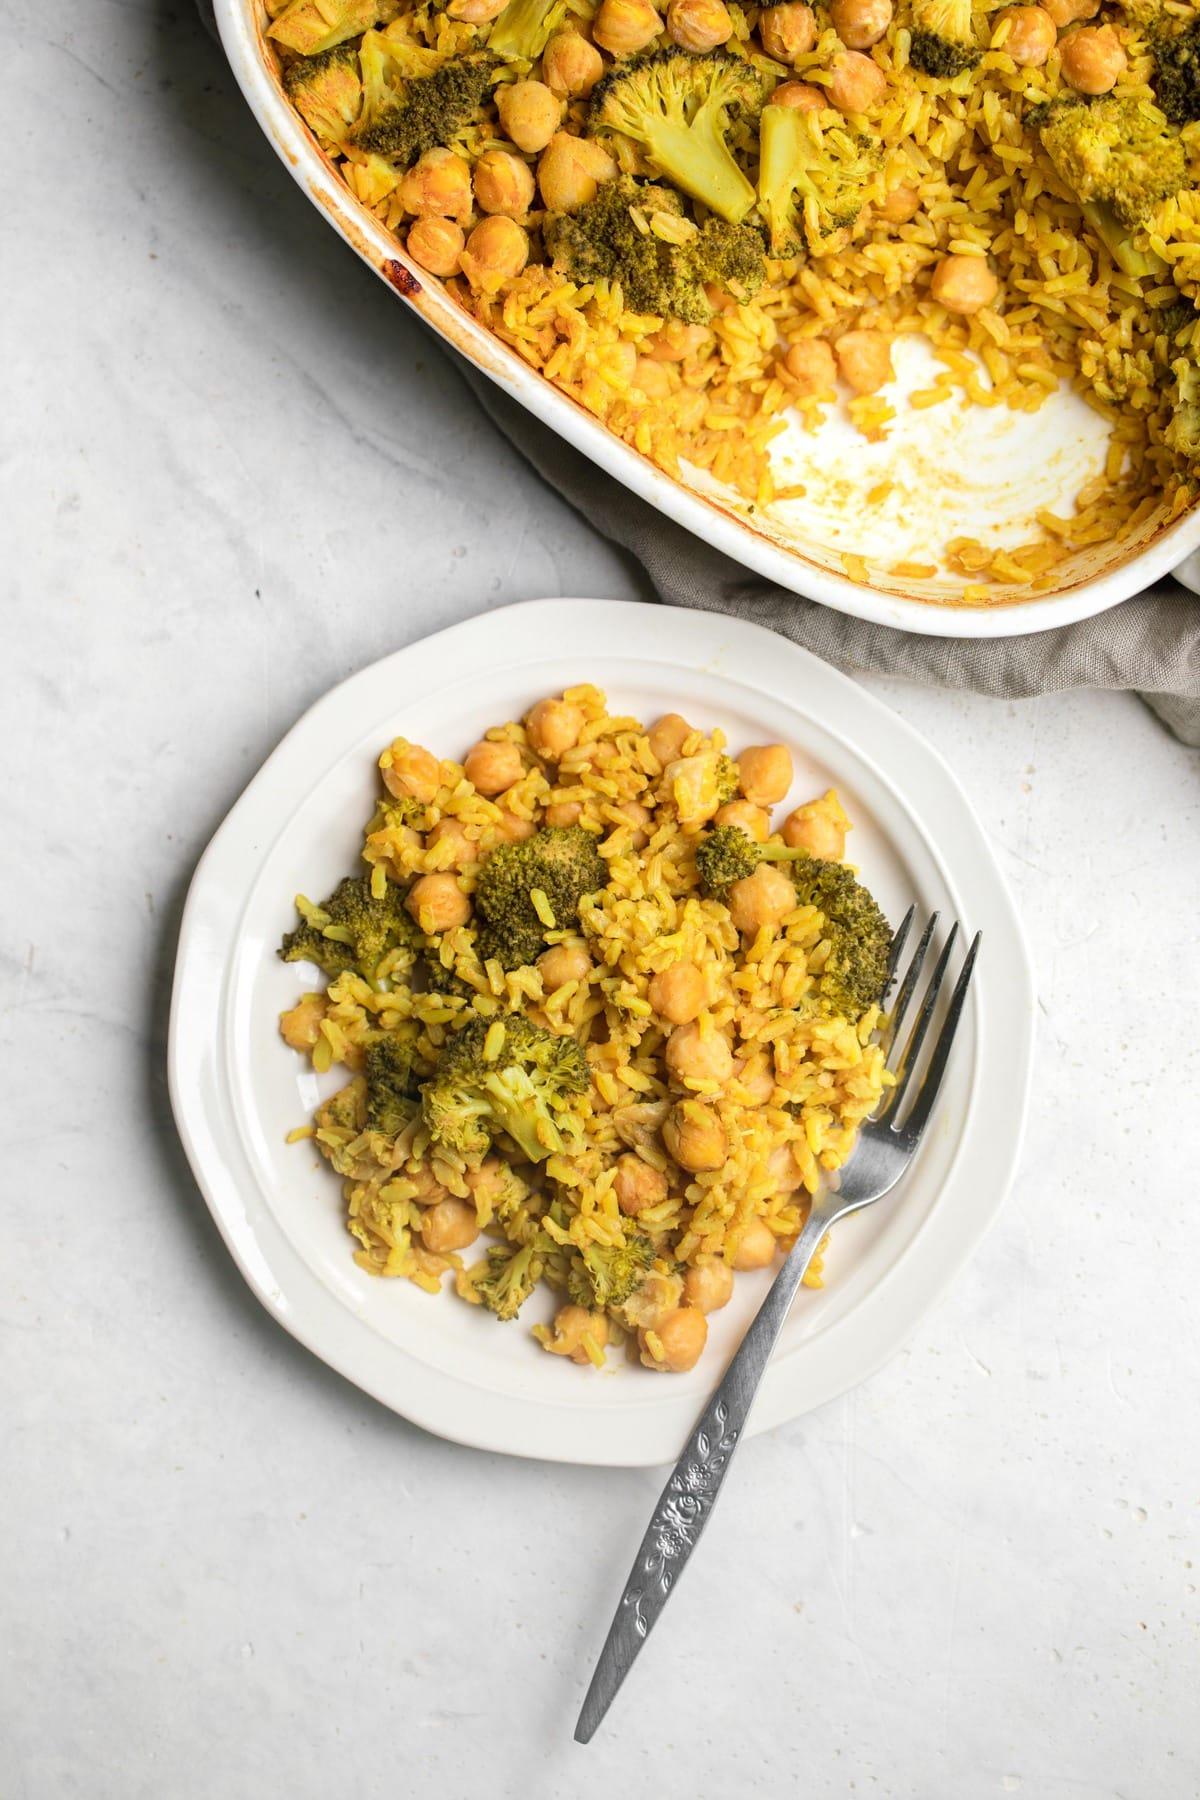 broccoli rice casserole served on white plate